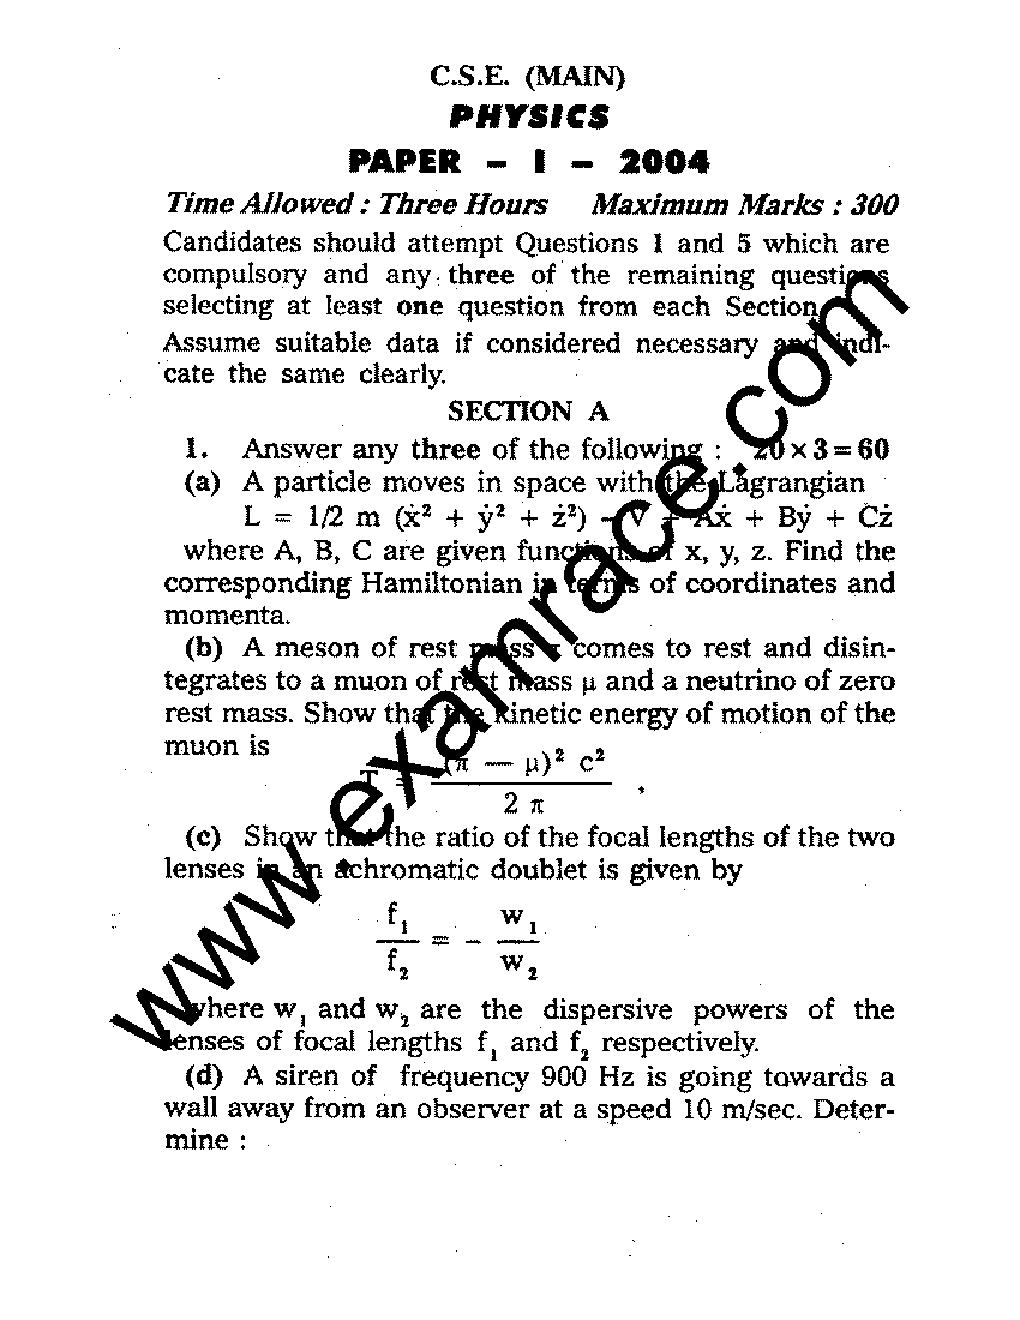 IAS Mains Physics 2004- Translation in Hindi, Kannada